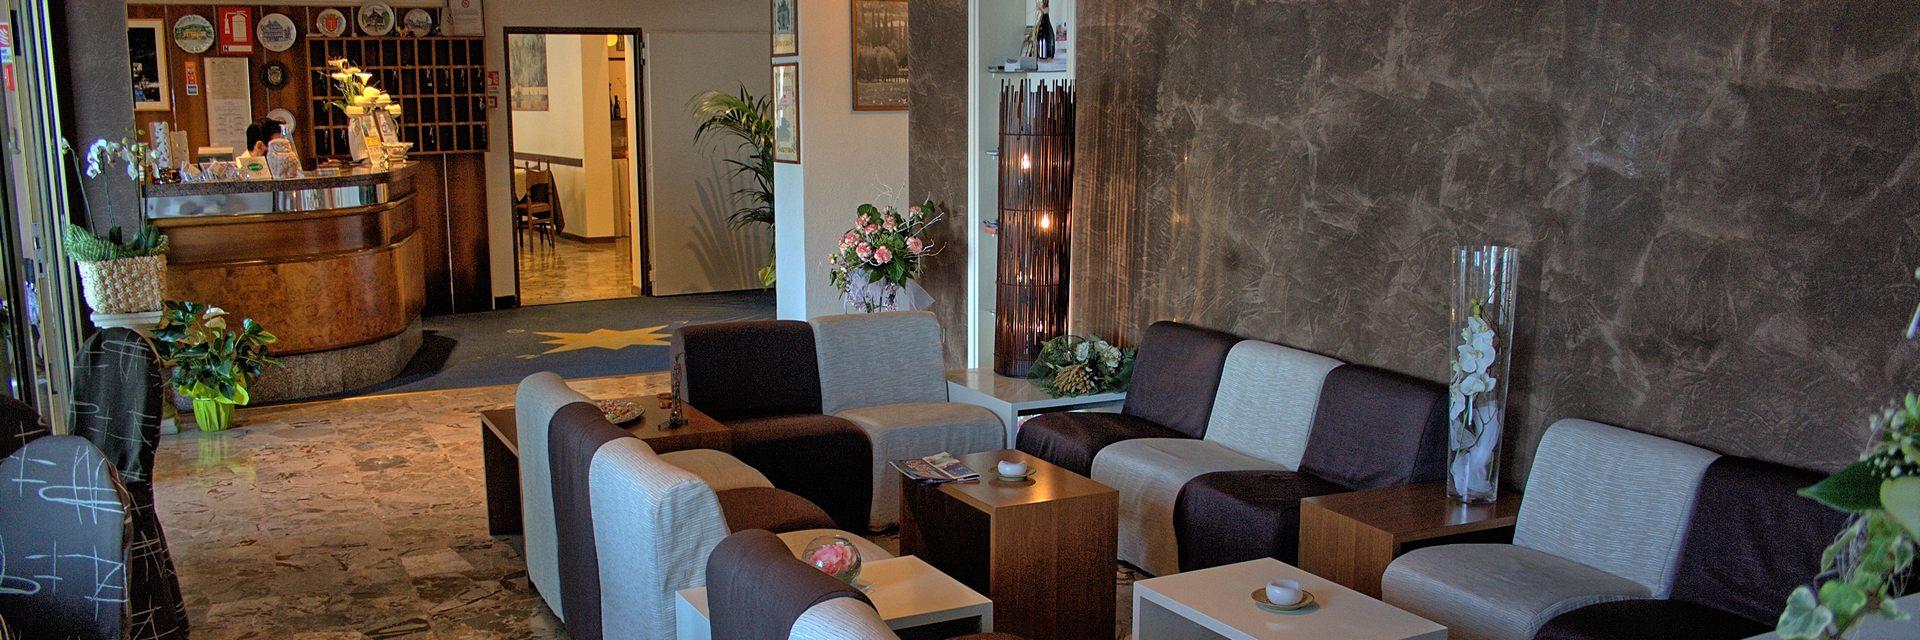 hotel-ristorante-menapace-torri-del-benaco-02.jpg